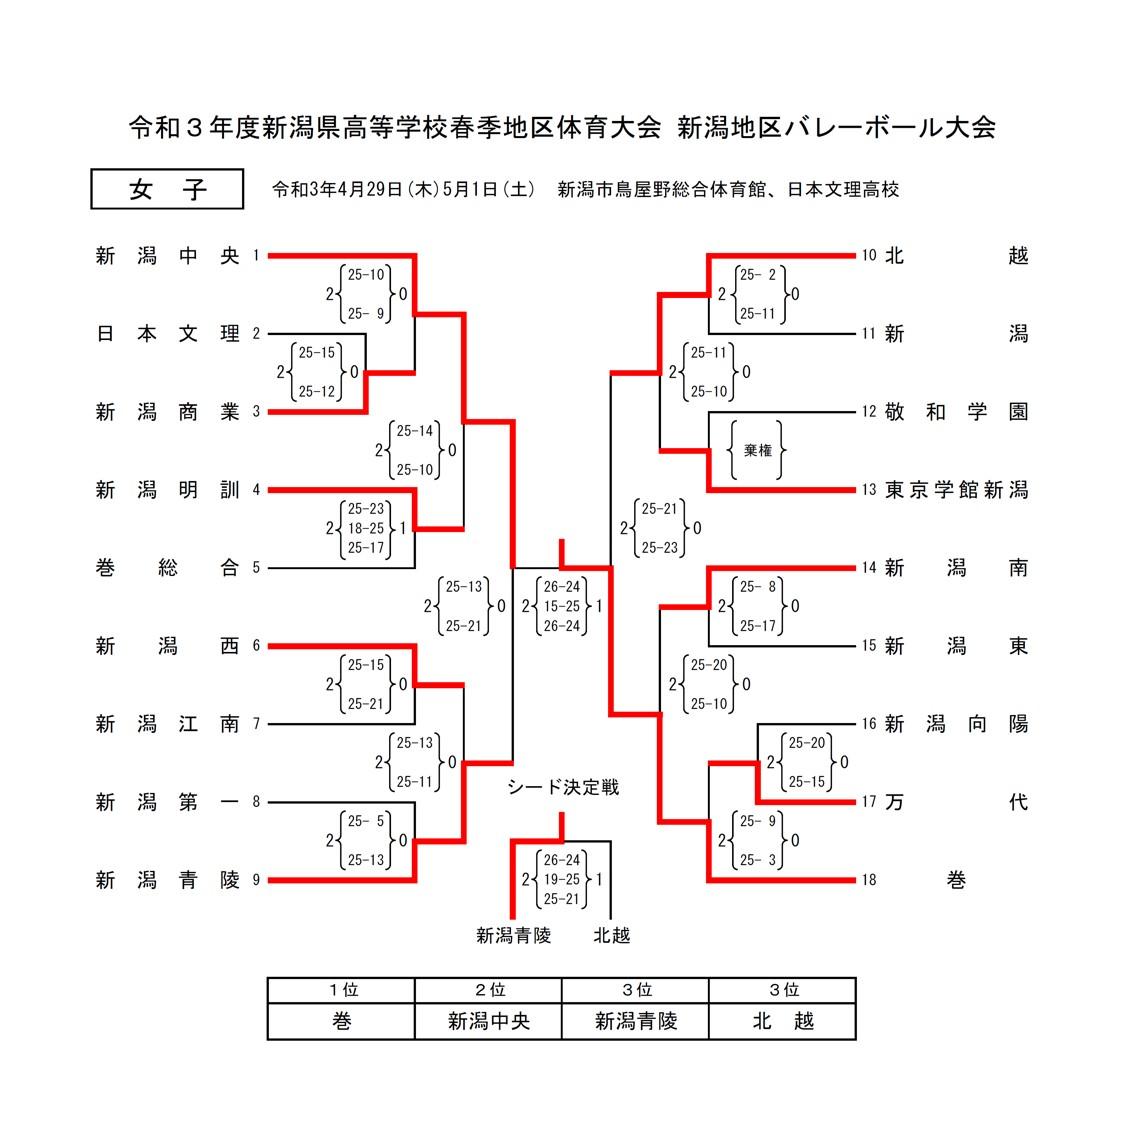 2021年度_インターハイ予選_新潟県_新潟地区_女子_結果